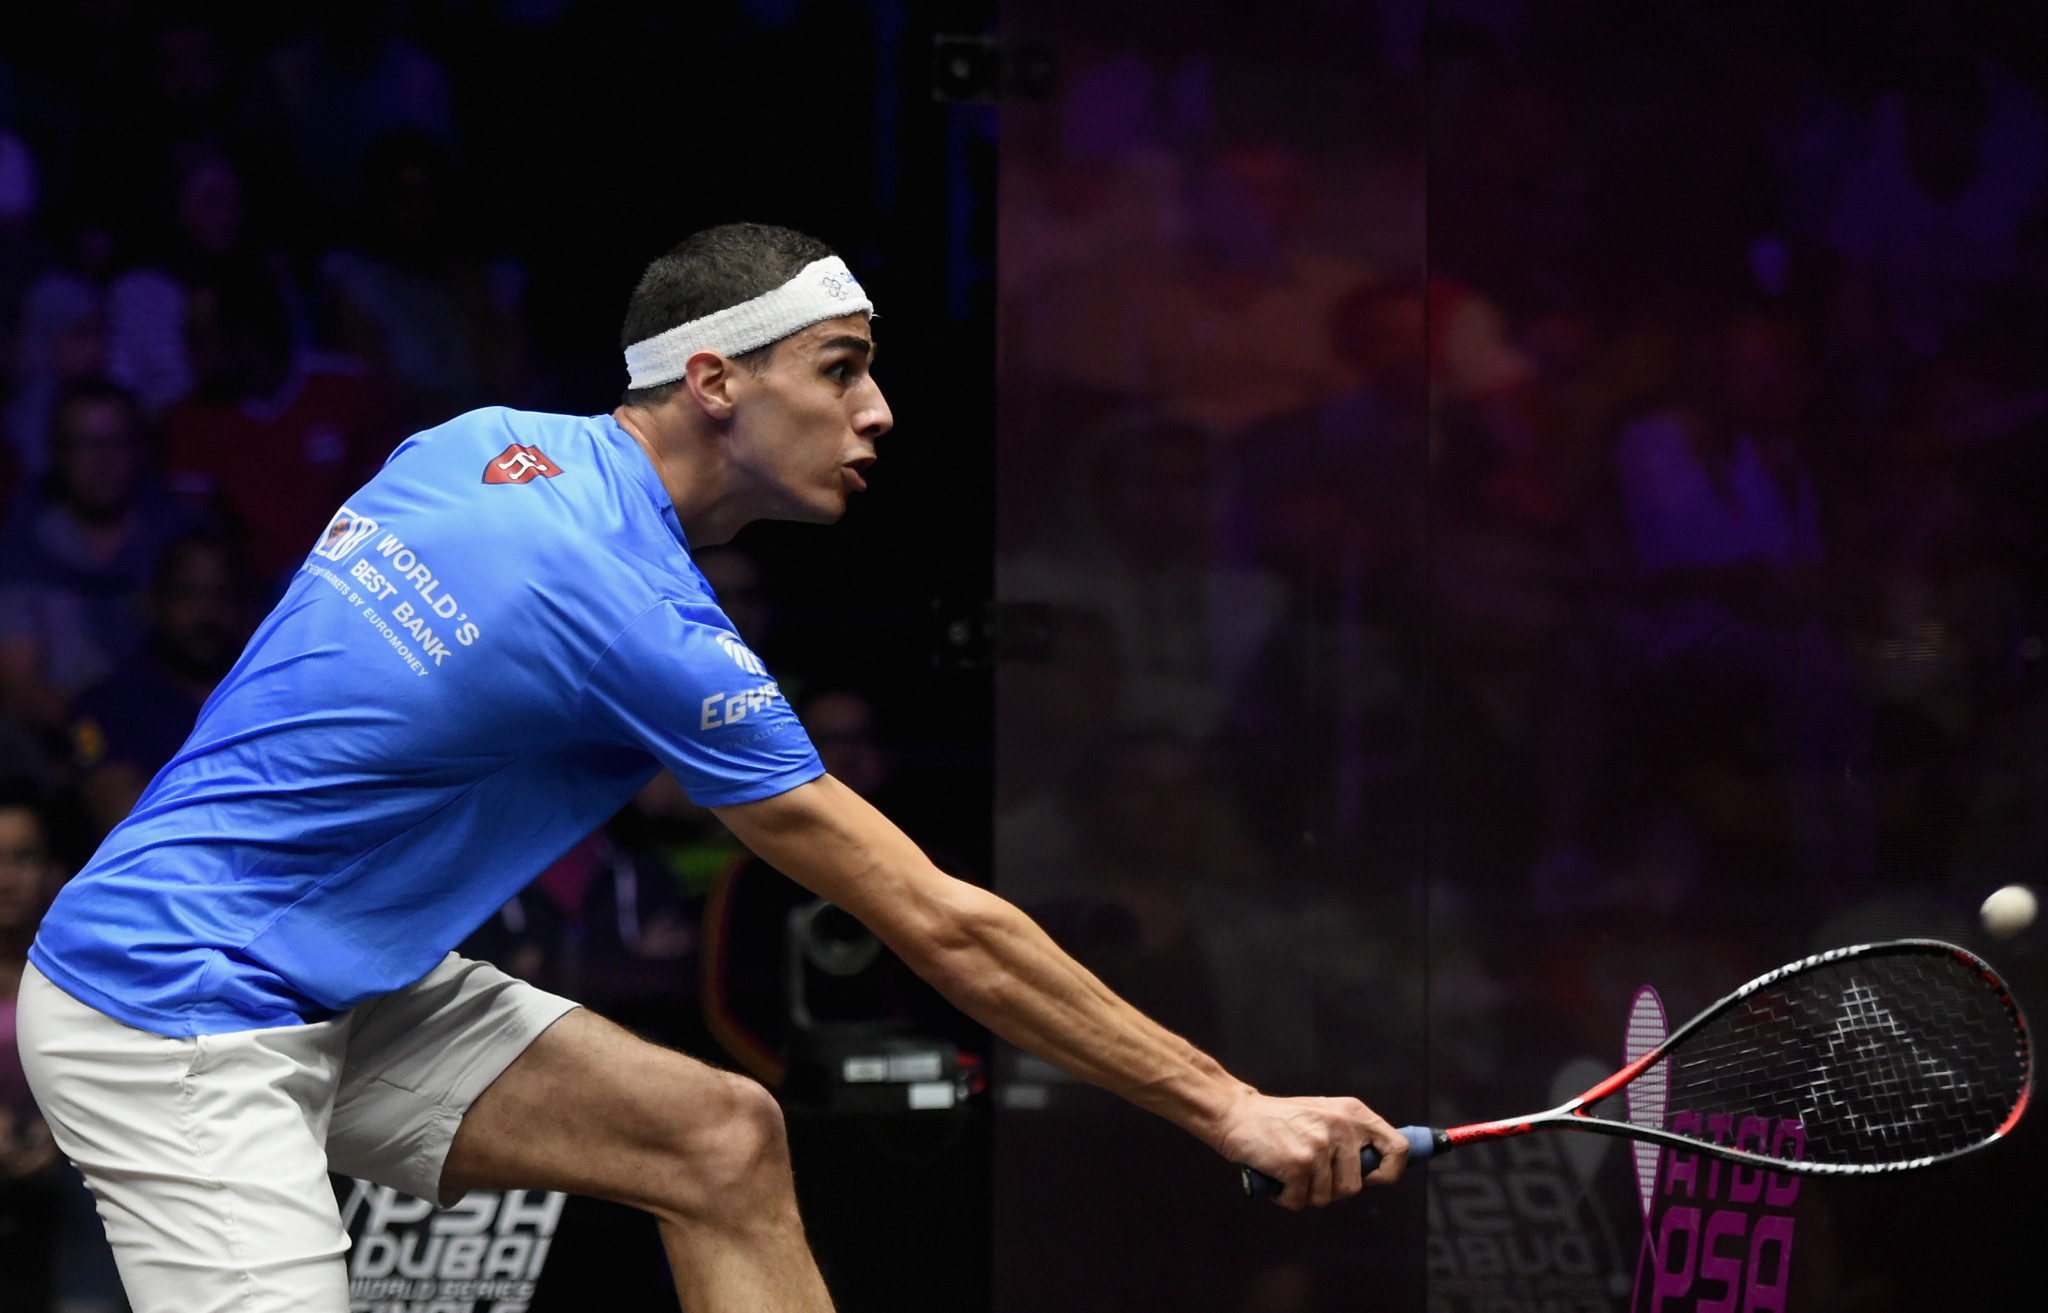 Farag blitzes his way into Oracle Netsuite Open quarter-finals